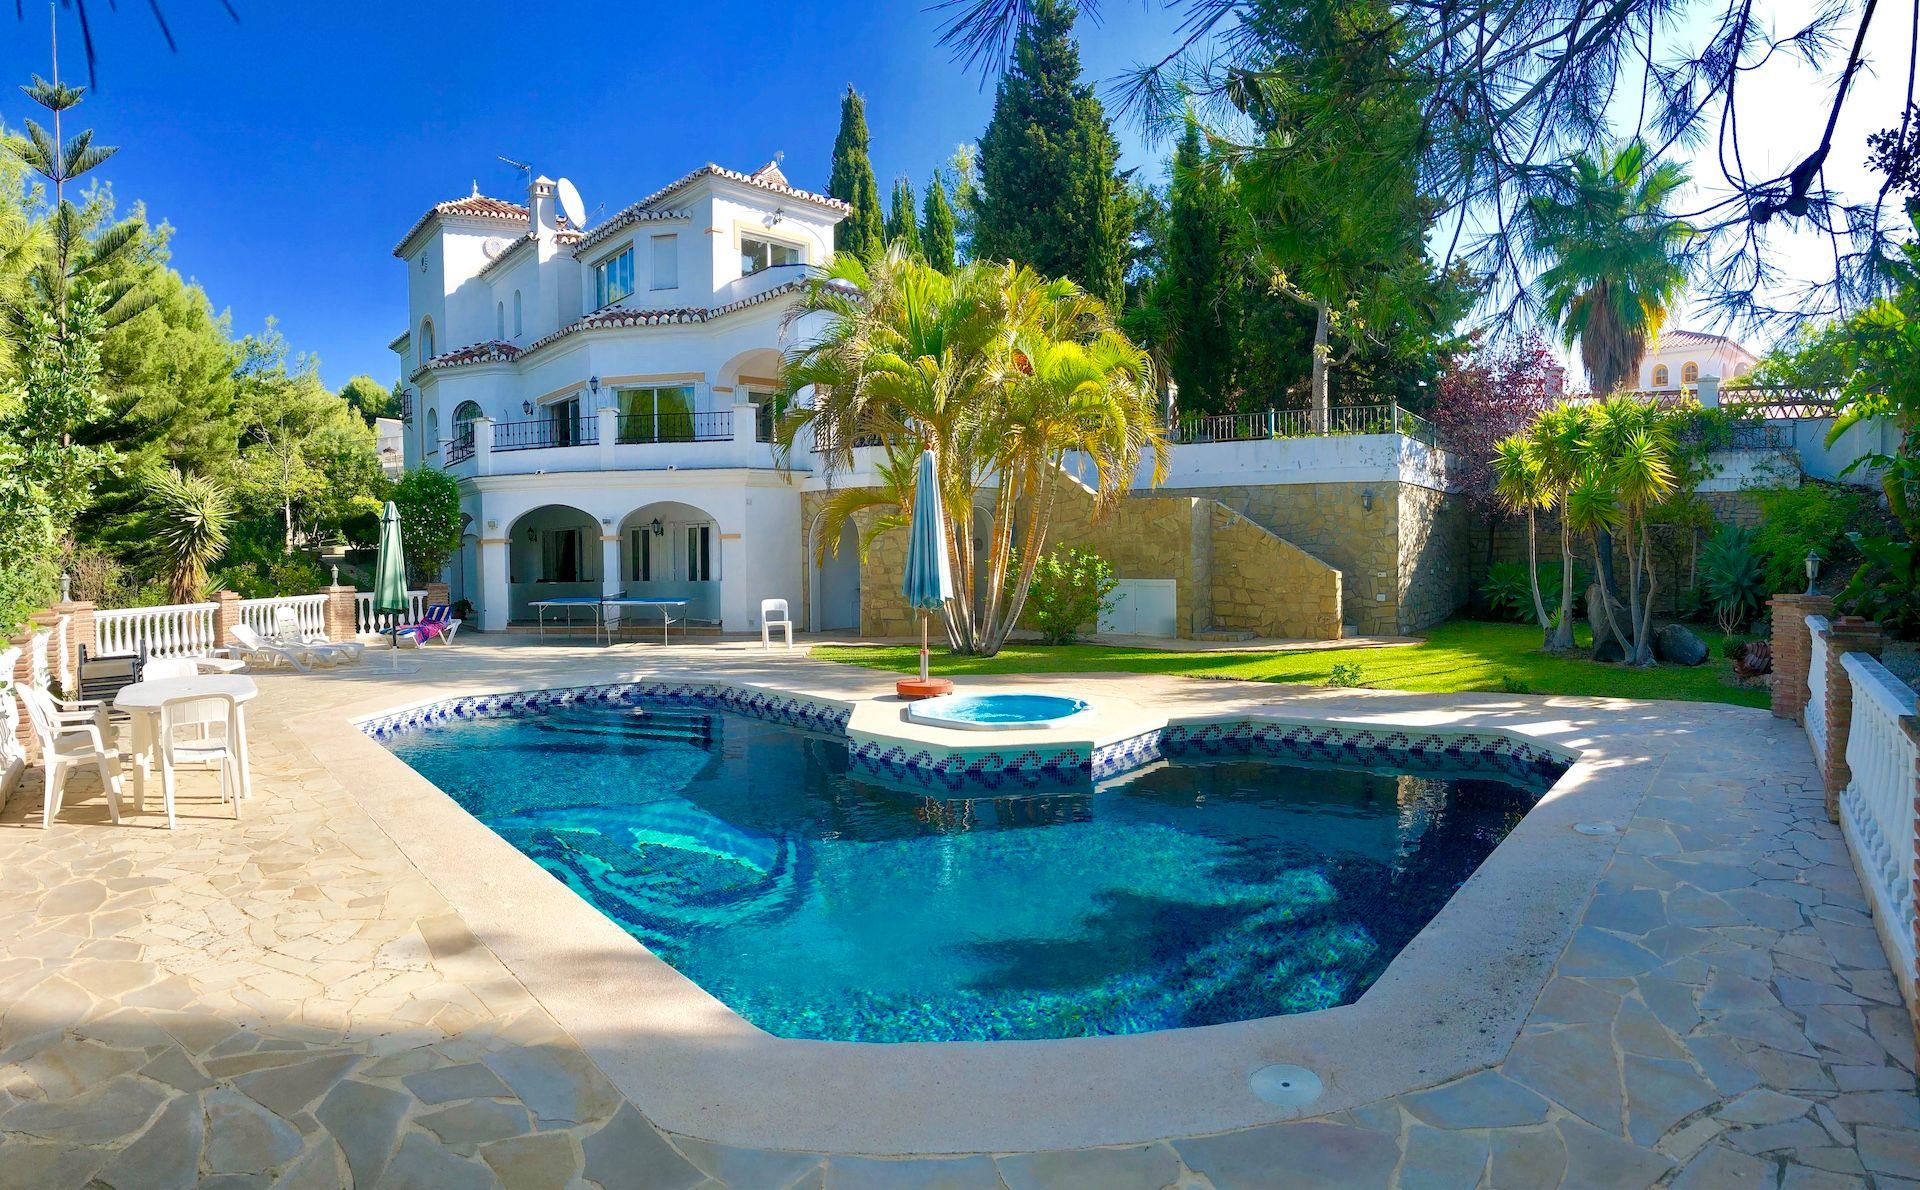 Luxury Villa in Frigiliana, Cortijo San Rafael, for sale